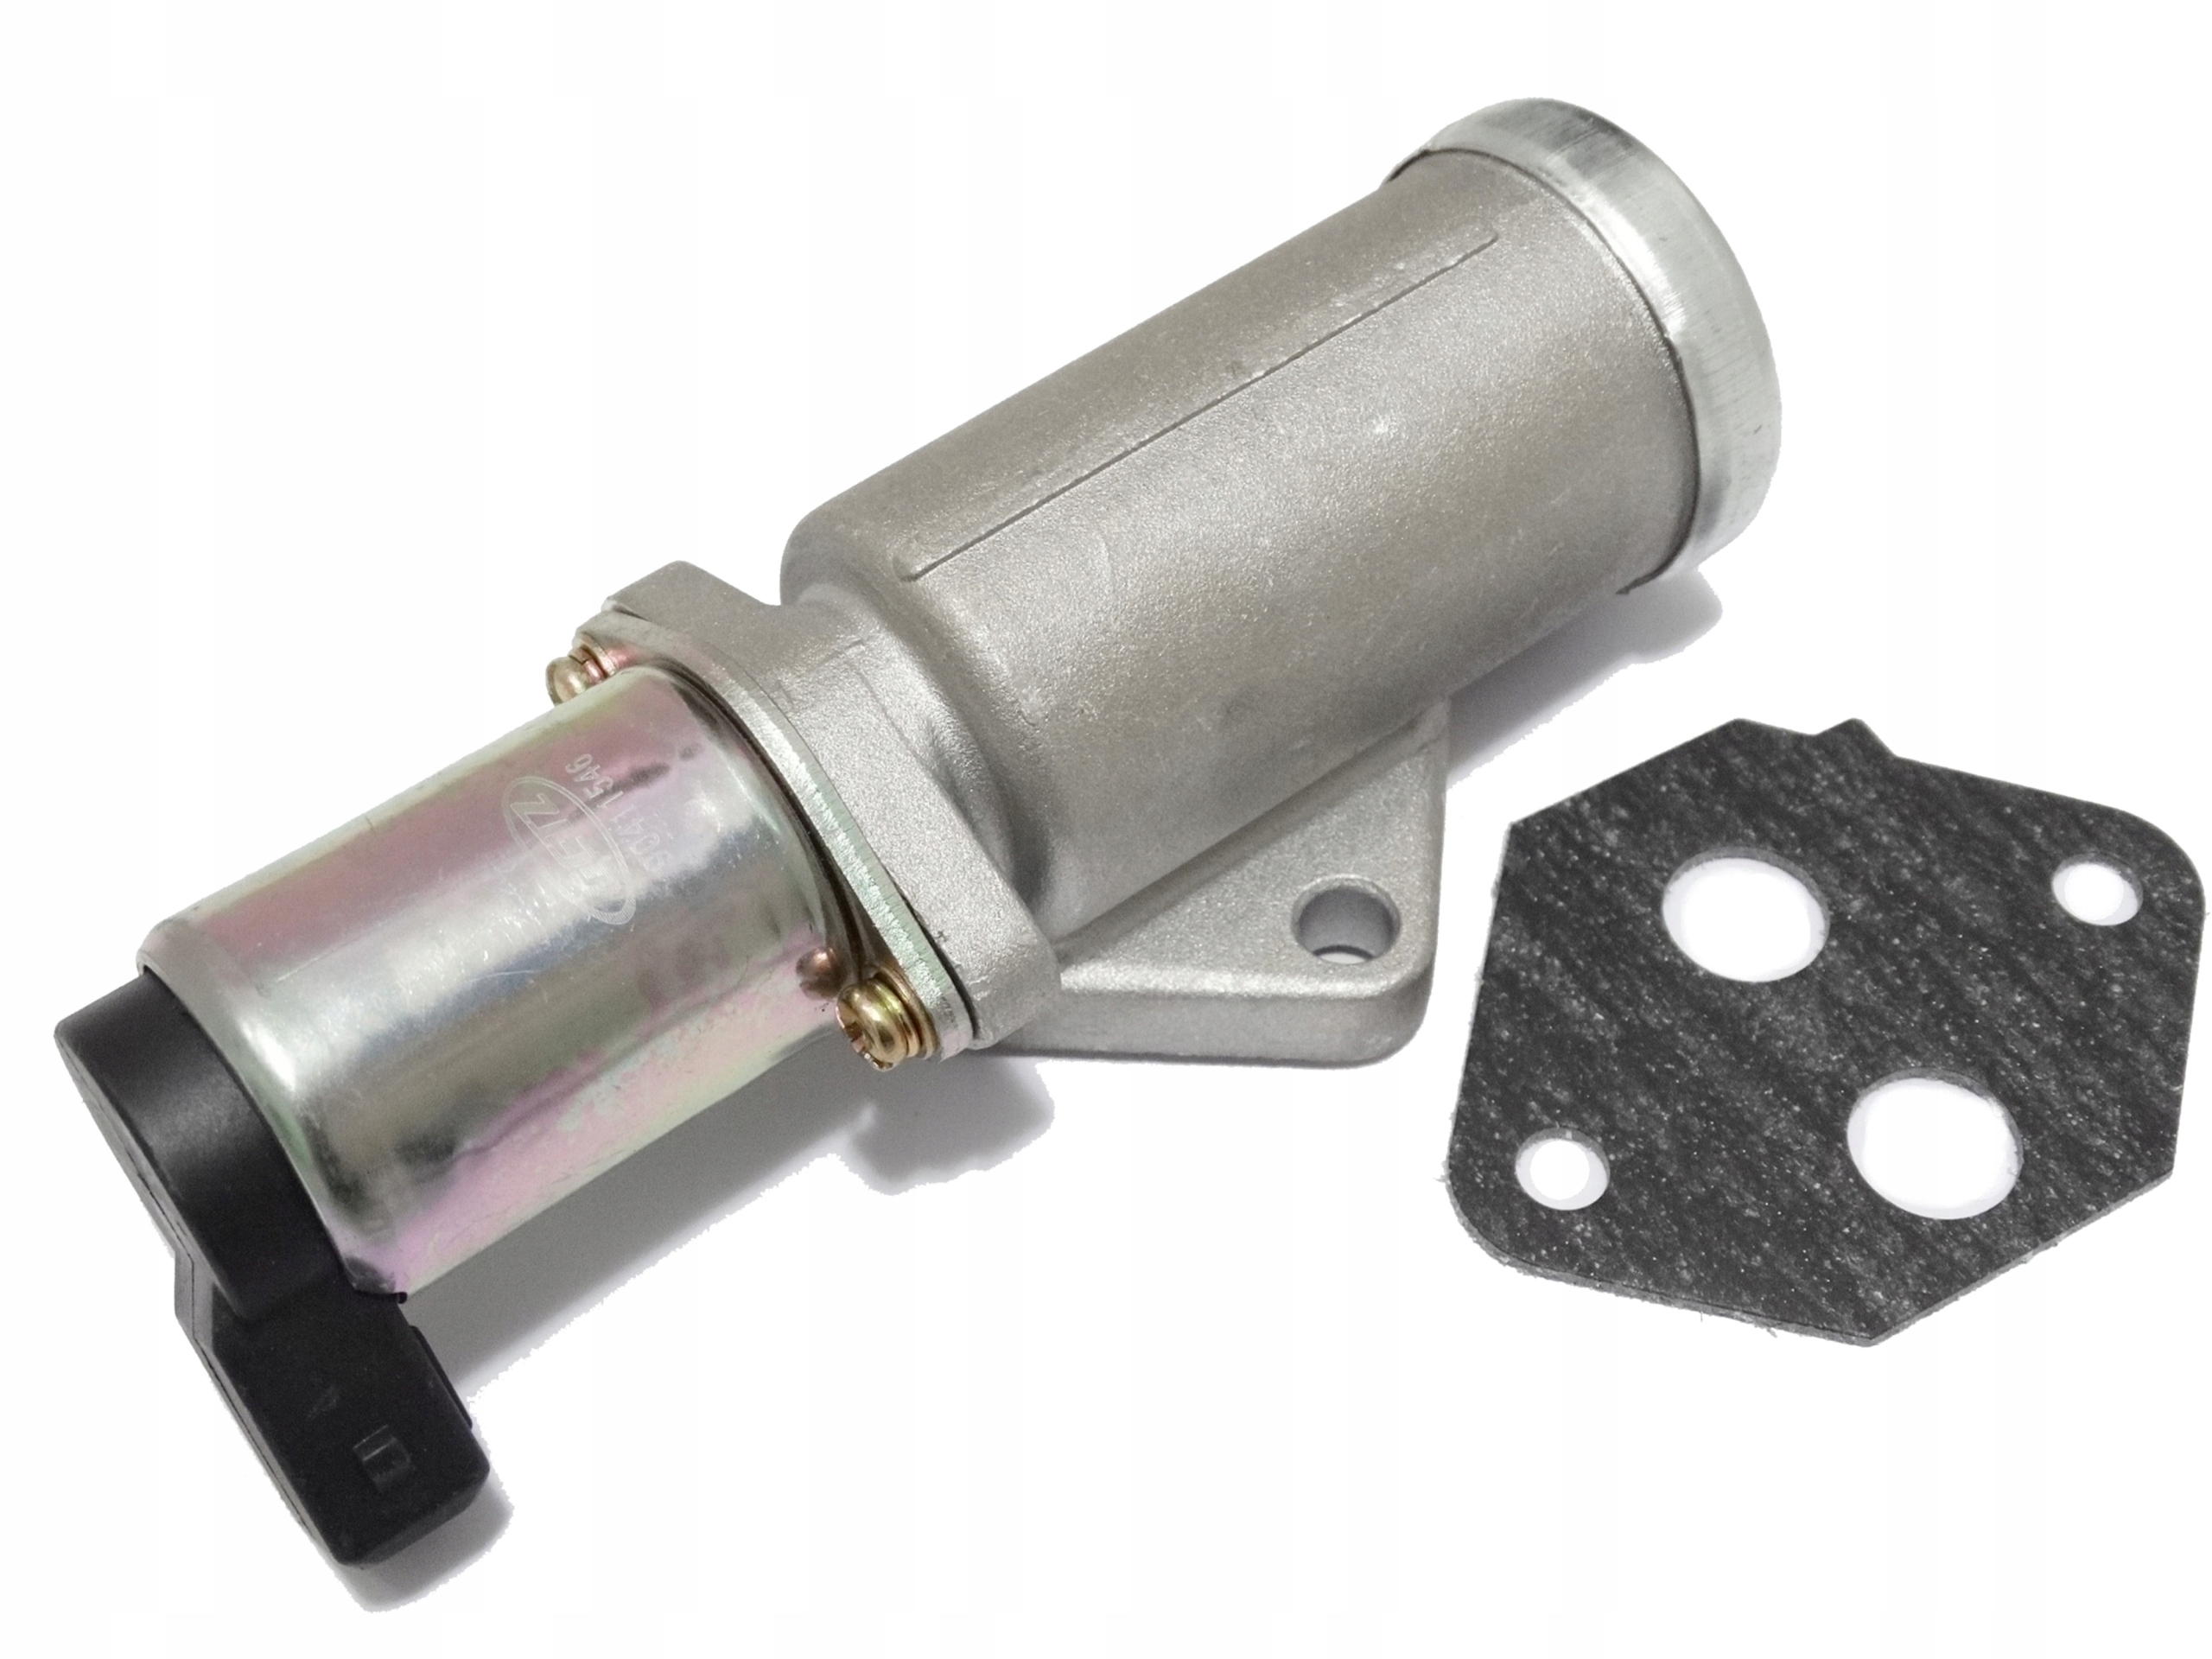 двигатель шаговый opel омега b vectra a b 1 8 2 0 16v